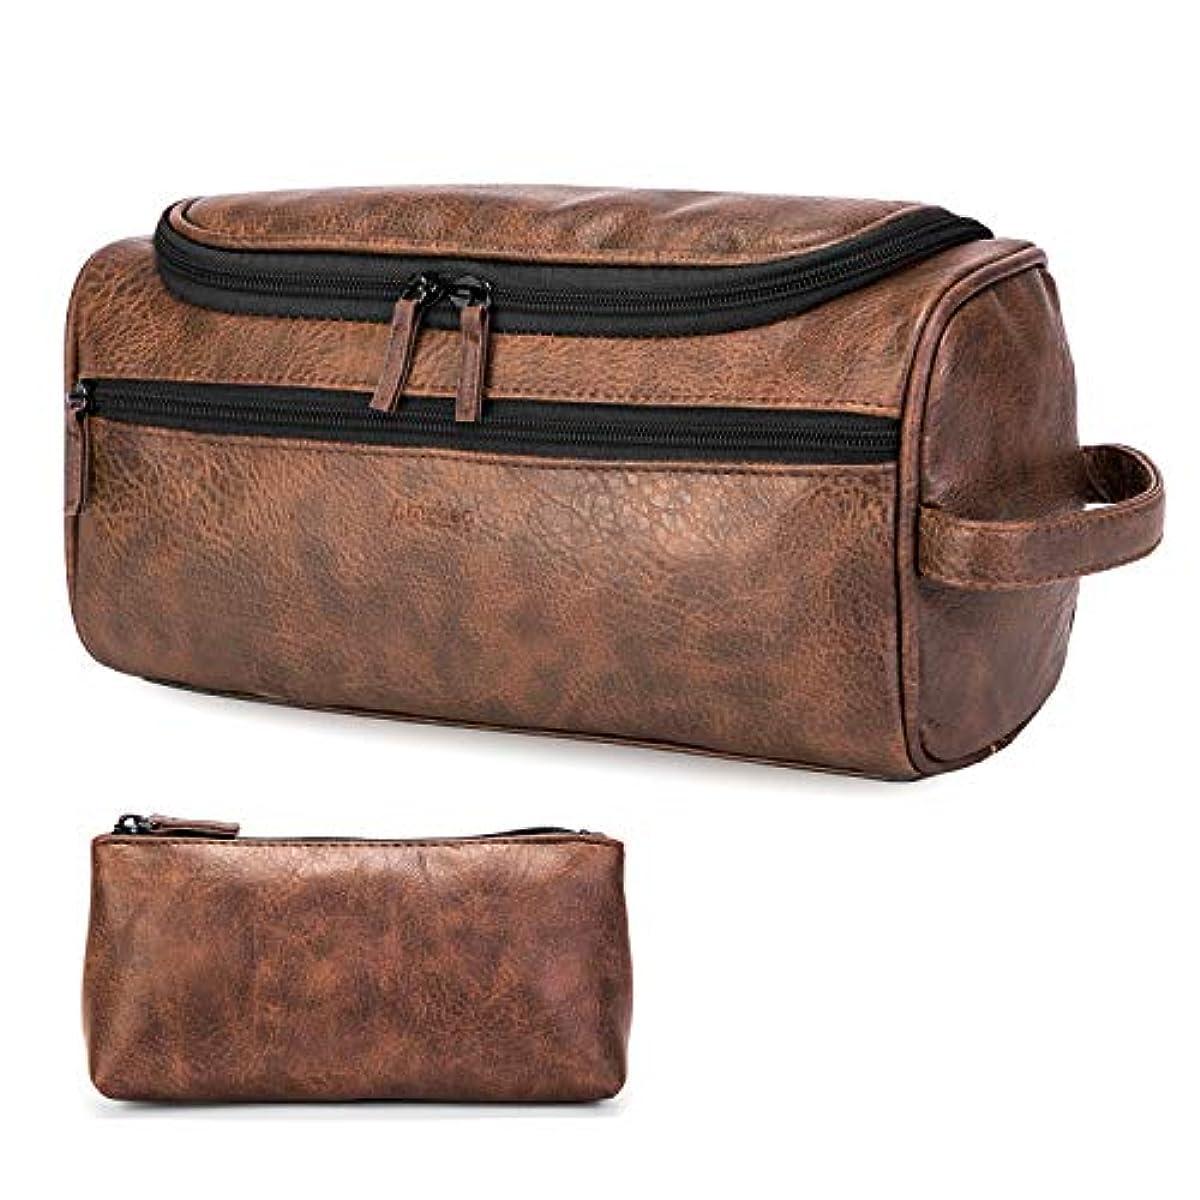 b9f8d100754 Details about Leather Toiletry Bag Travel Organizer Portable For Men Women  Vintage Design